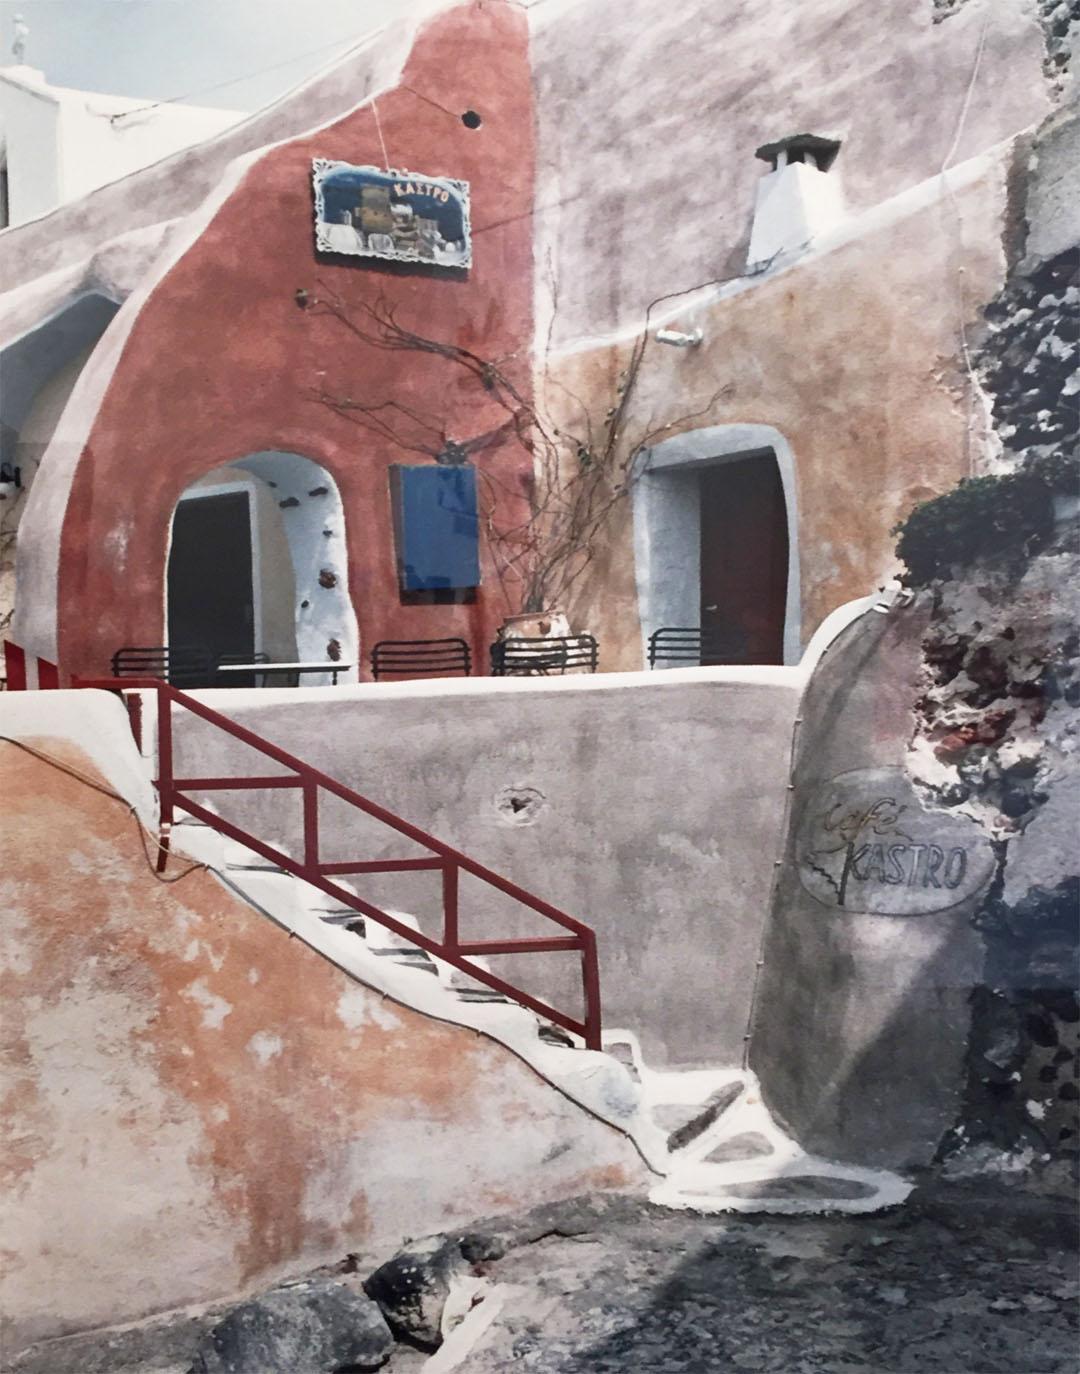 Kastro (Castle) Cafe Oia, Santorini, Greece   Elizabeth Atly